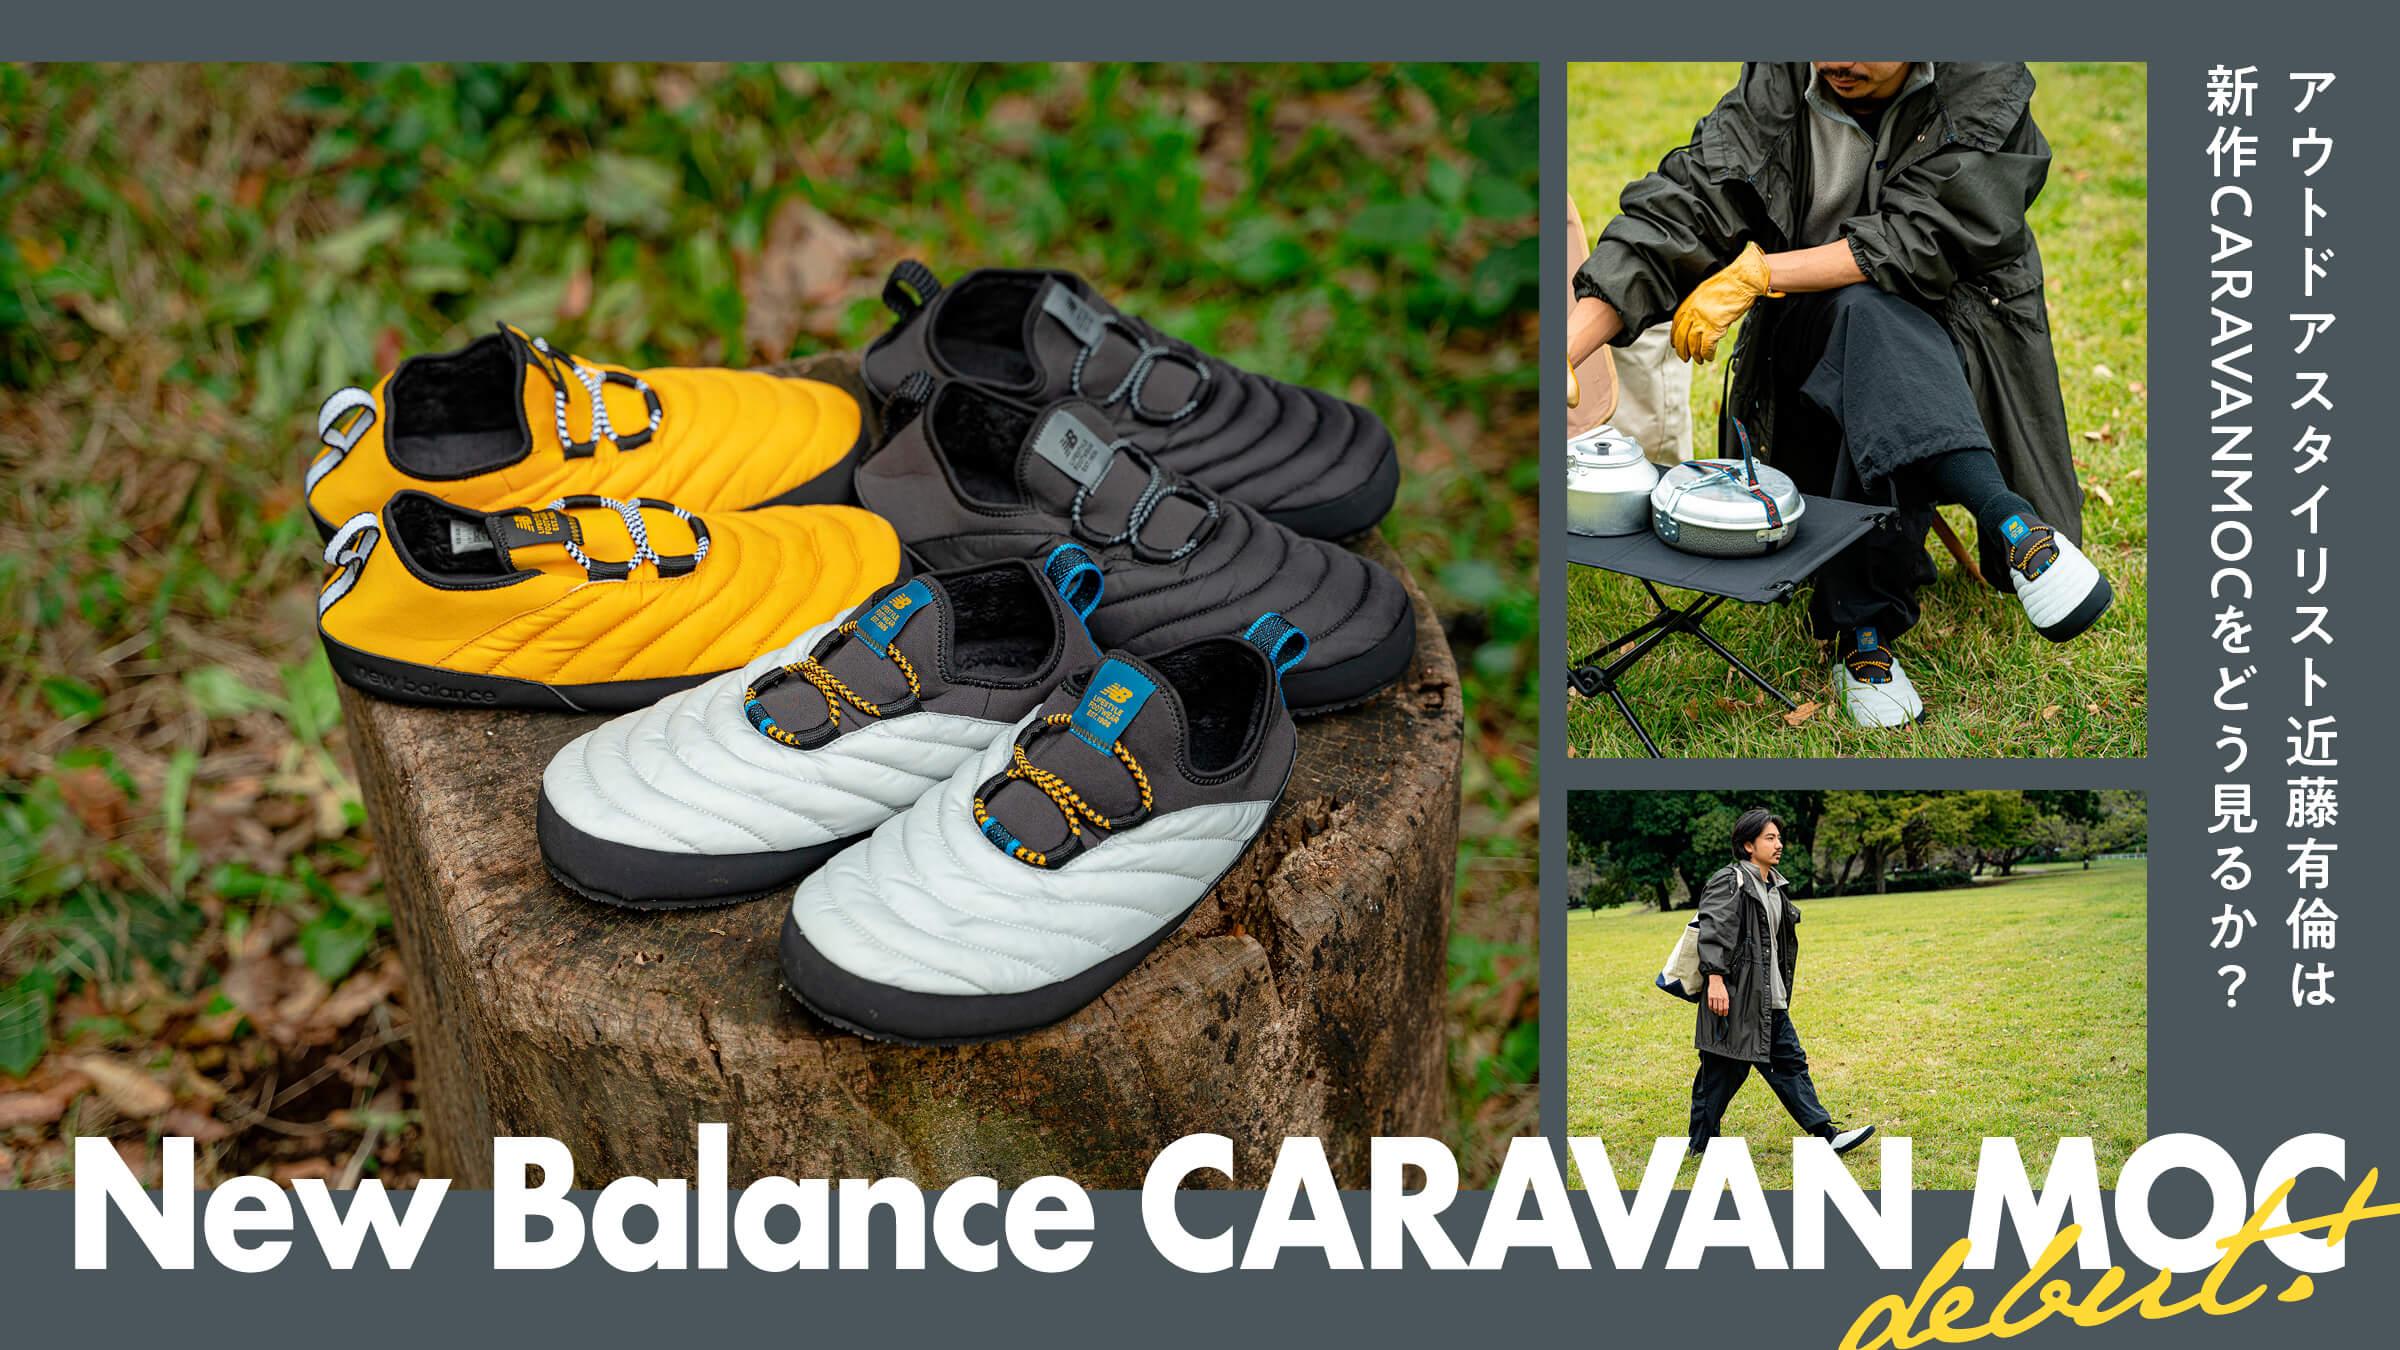 New Balance 「CARAVAN MOC」 debut! <br>アウトドアスタイリスト近藤有倫は新作CARAVAN MOCをどう見るか?